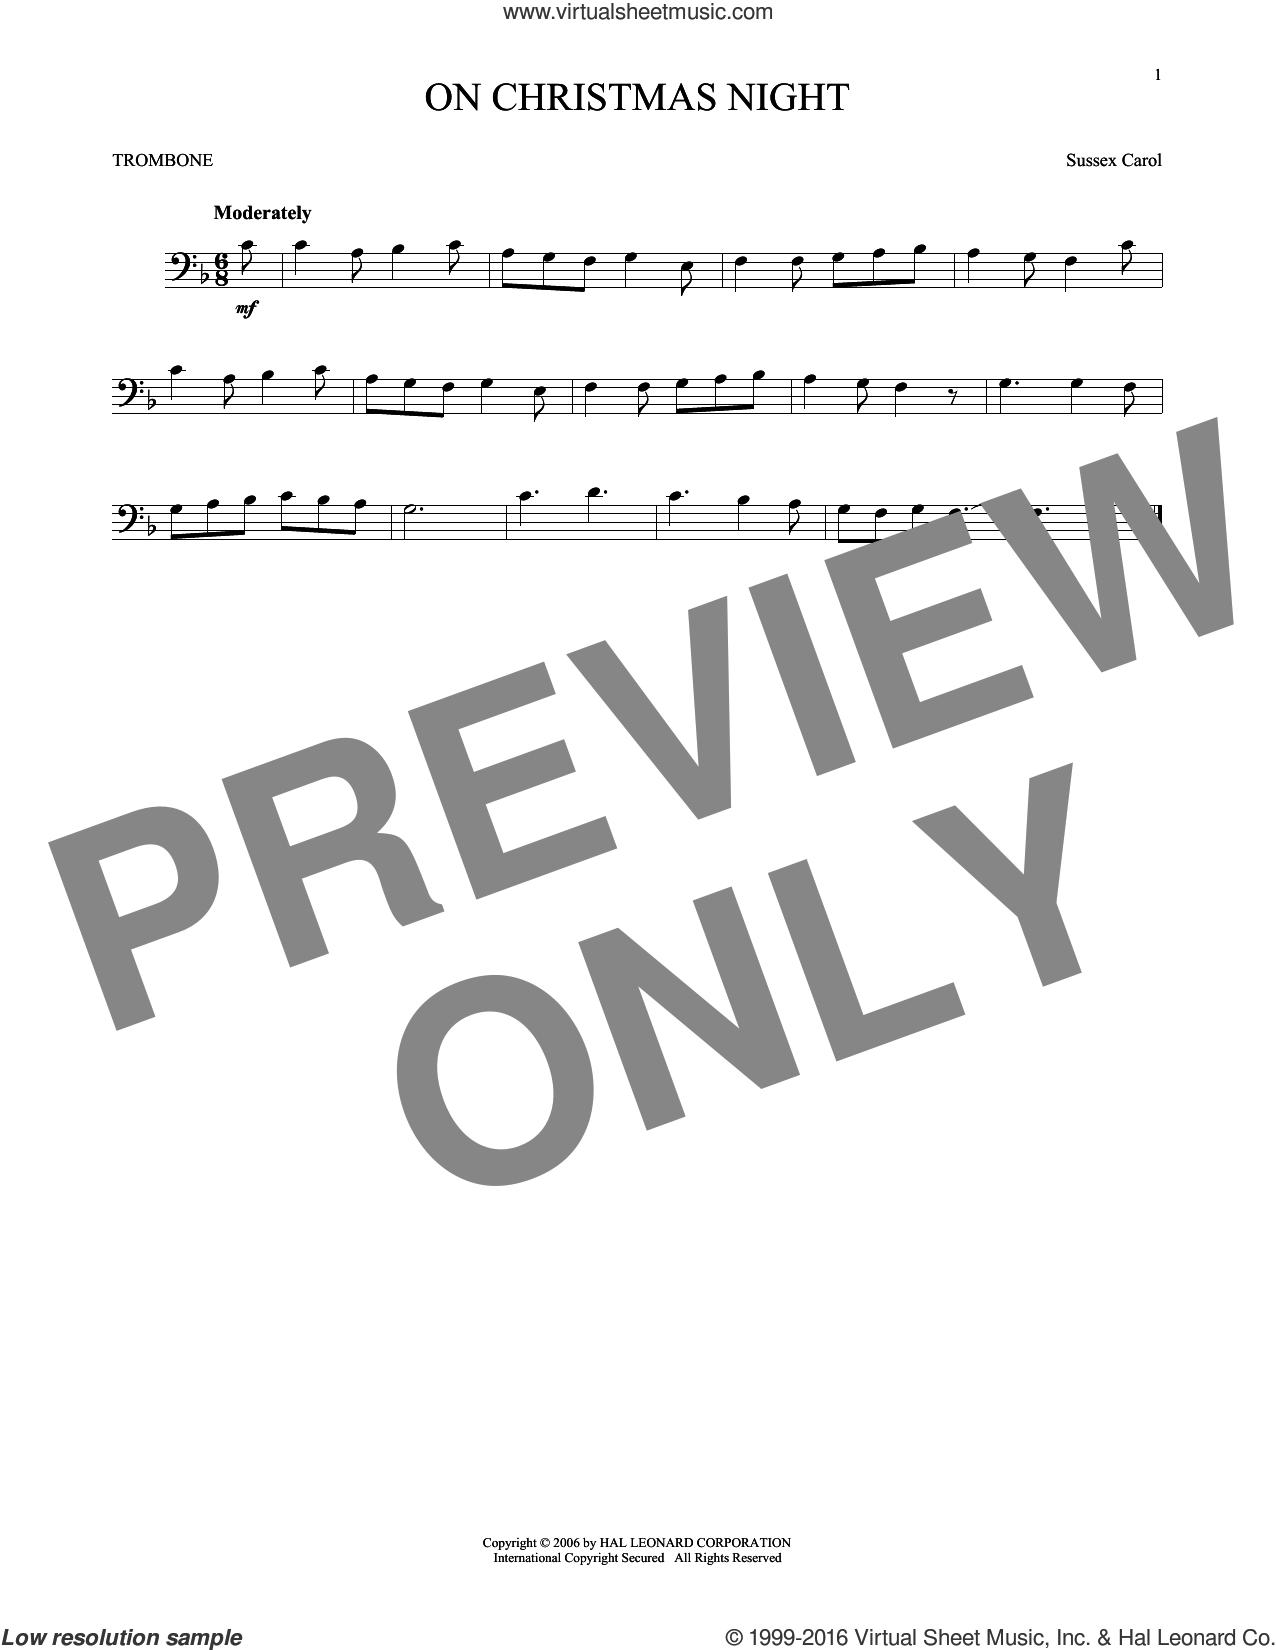 On Christmas Night sheet music for trombone solo, intermediate skill level